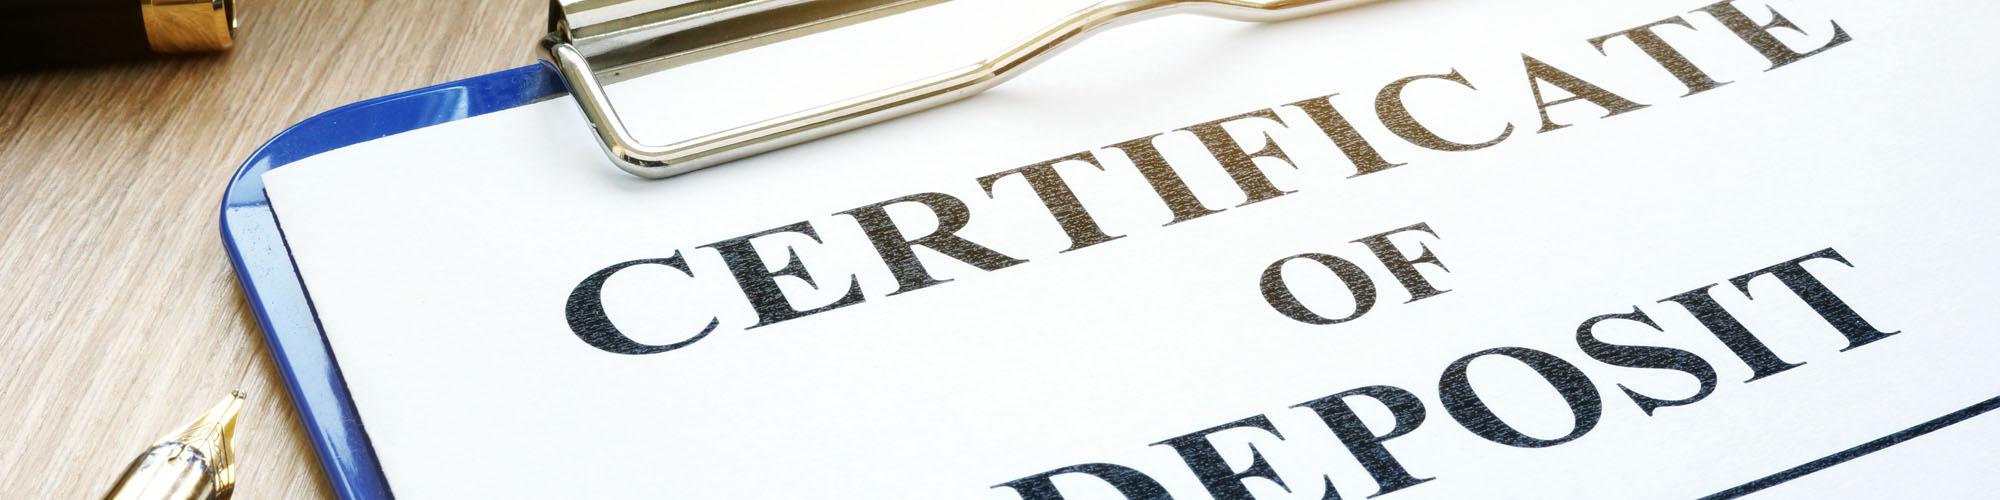 Certificates Of Deposit Losb